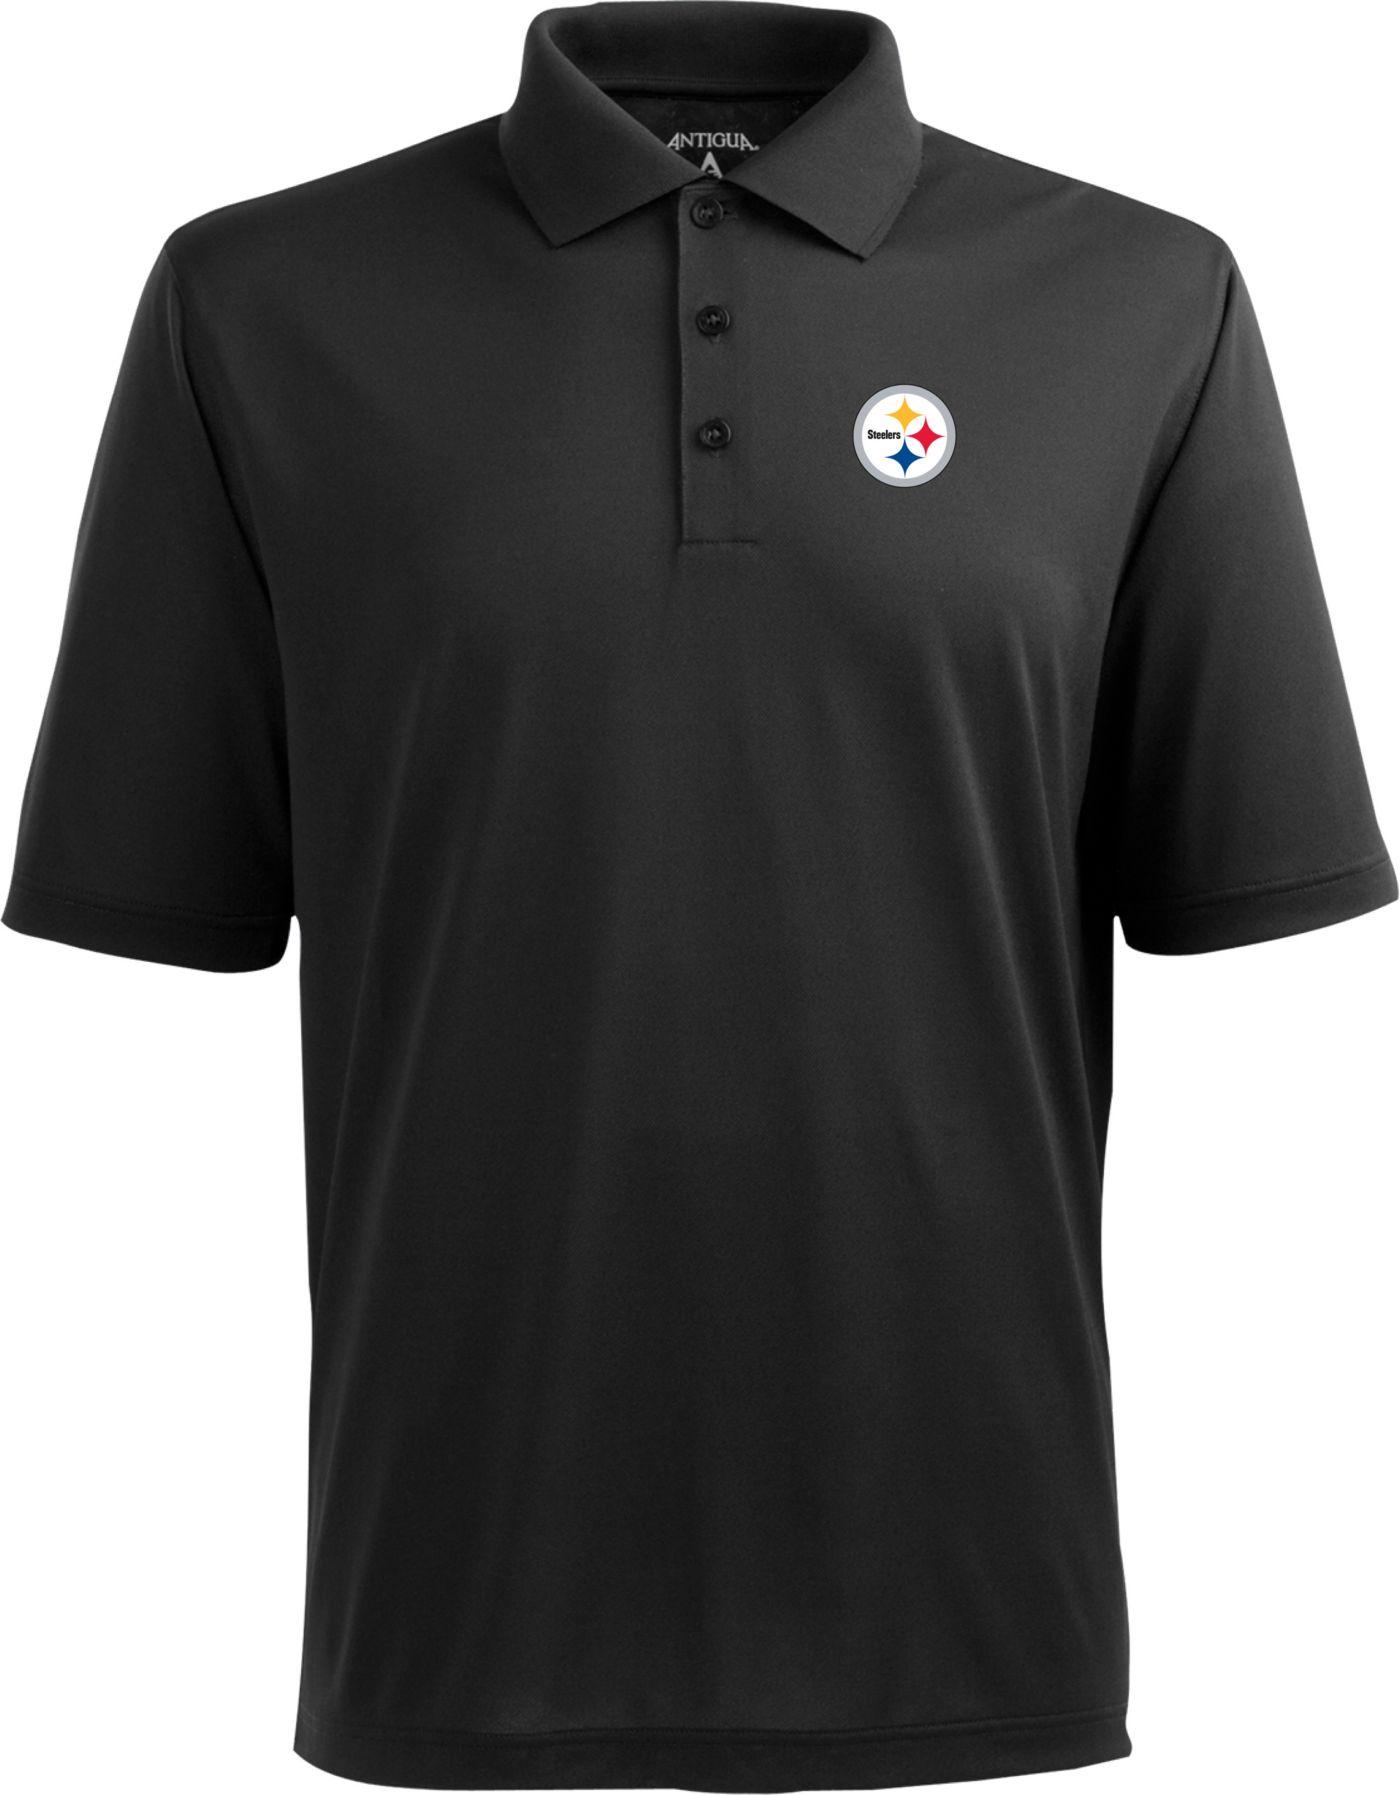 Antigua Pittsburgh Steelers Pique Xtra-Lite Black Polo